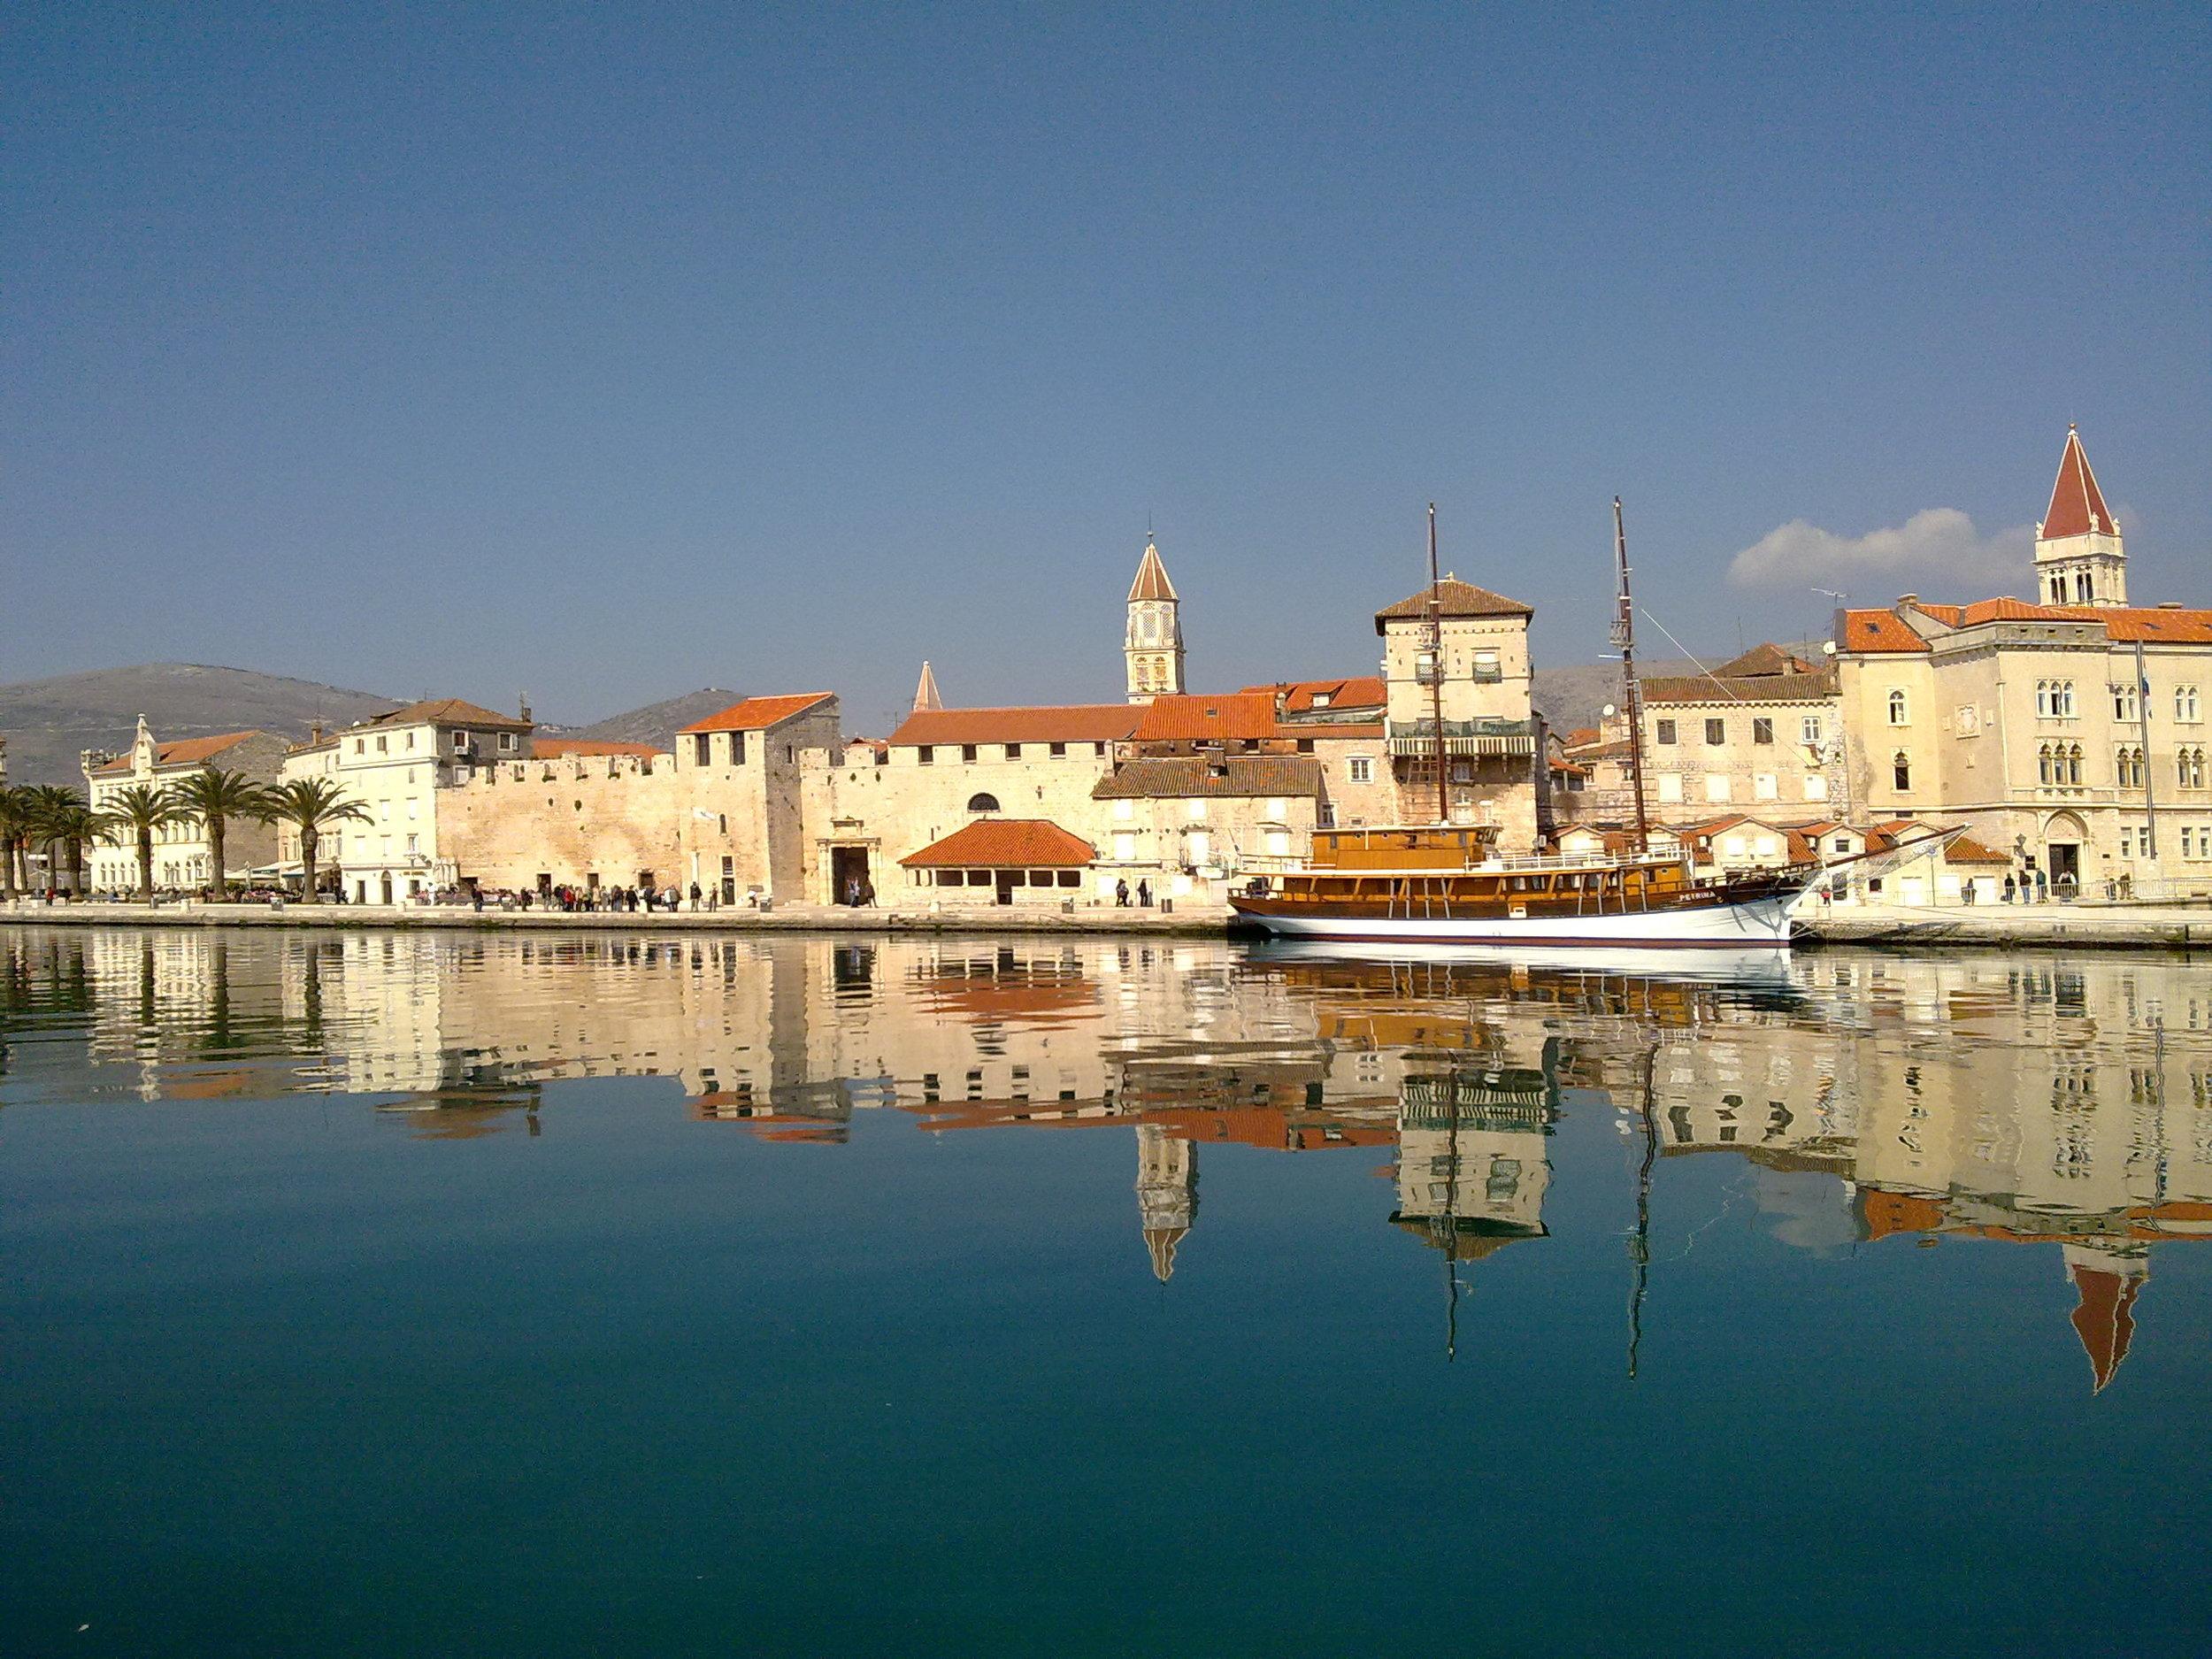 Trogir_from_island.jpg